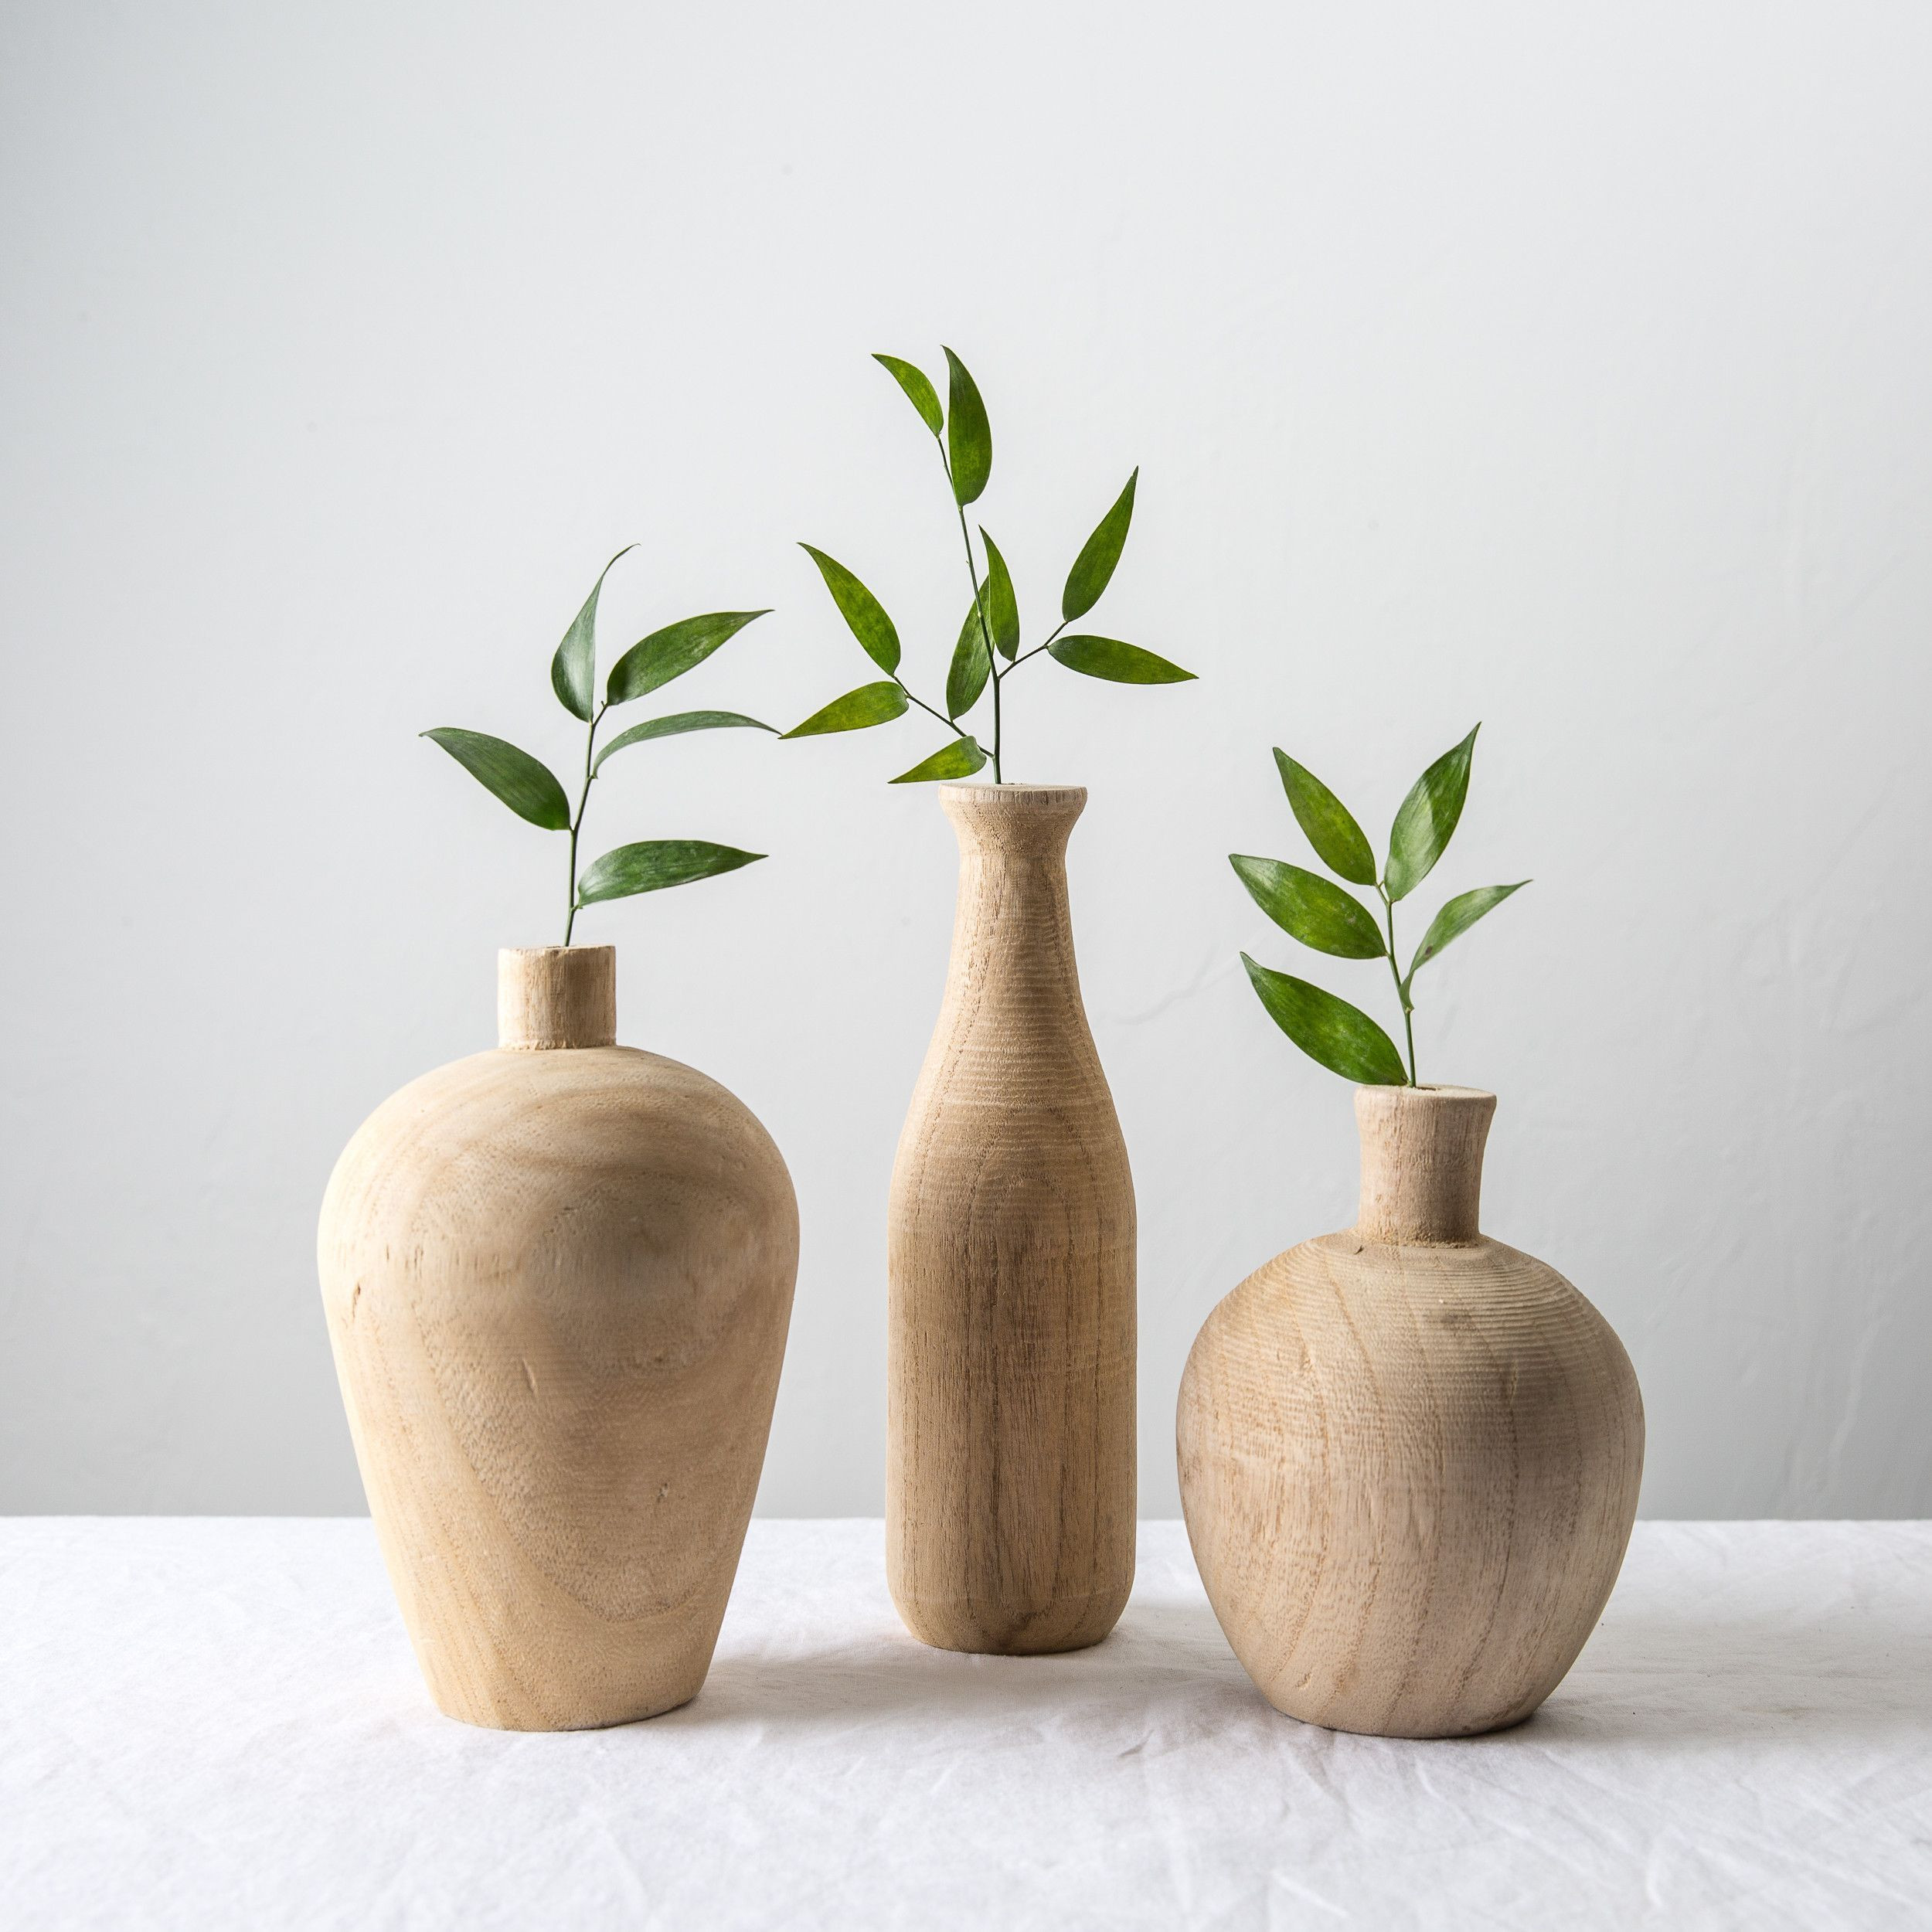 large round vase of 17 unique extra large vase bogekompresorturkiye com throughout the paulownia wood vase is a natural wooden vase that es in three different shapes